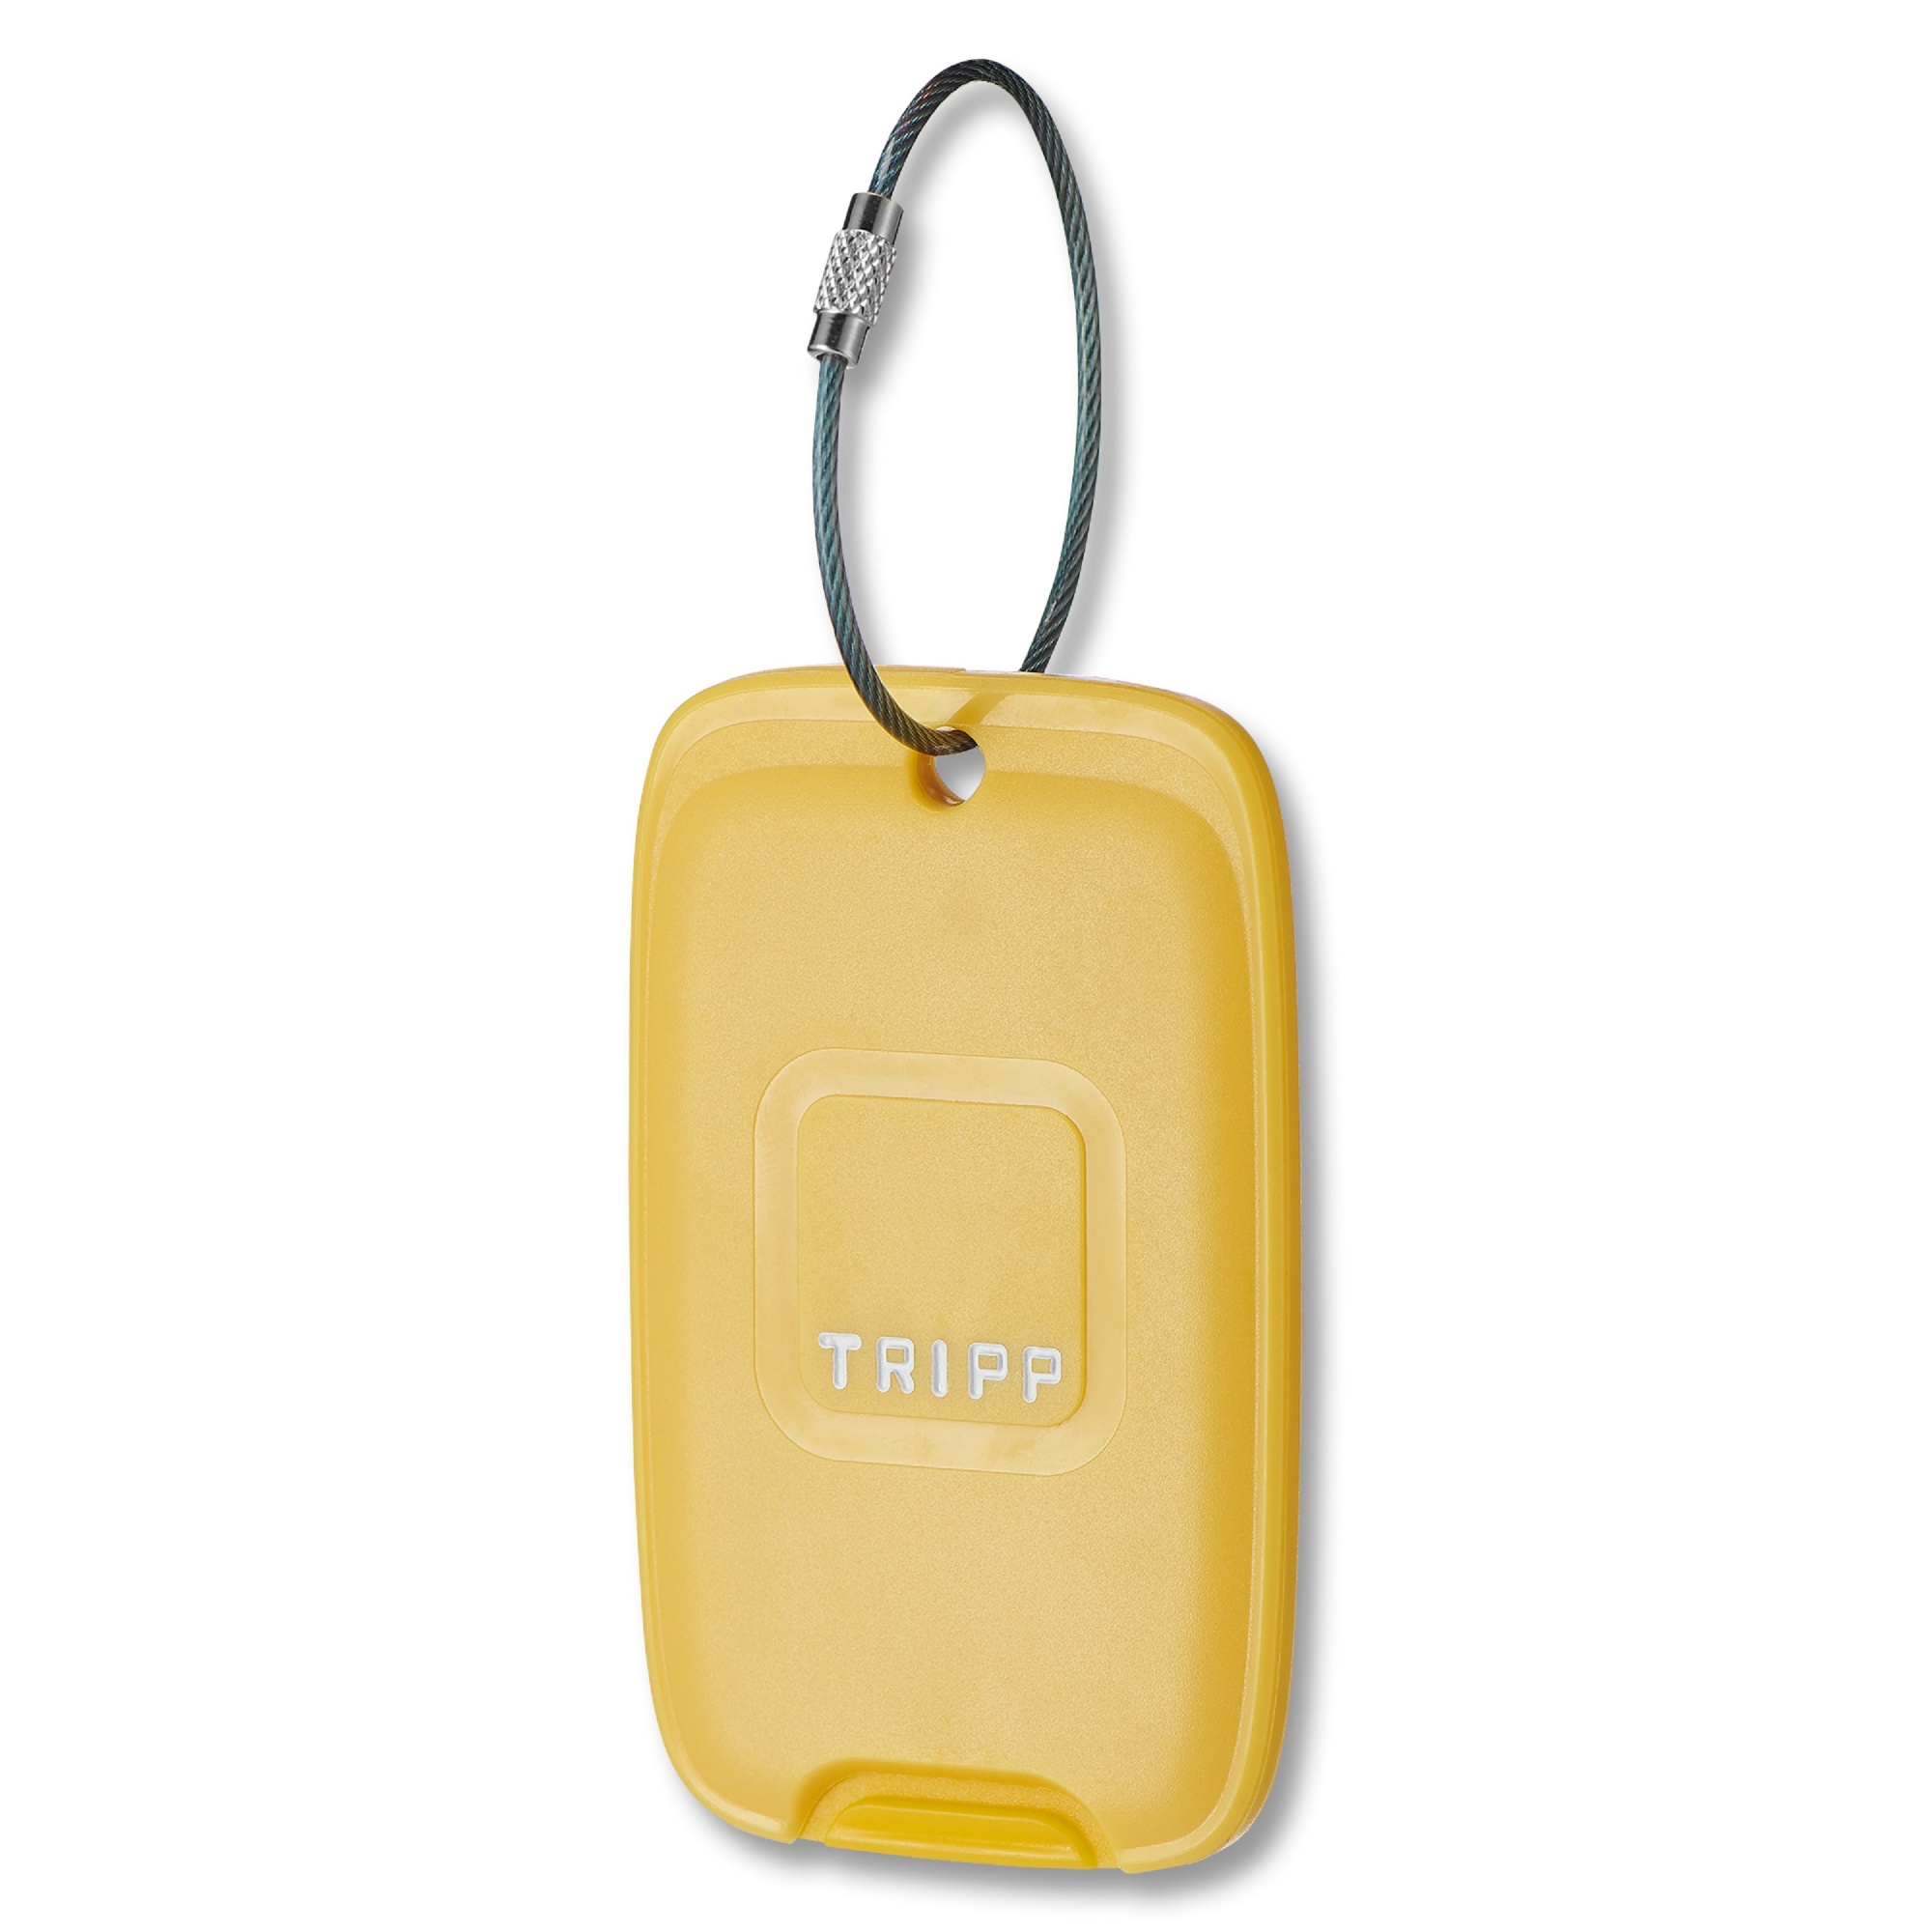 Tripp Banana Accessories Luggage Tag Luggage Tags